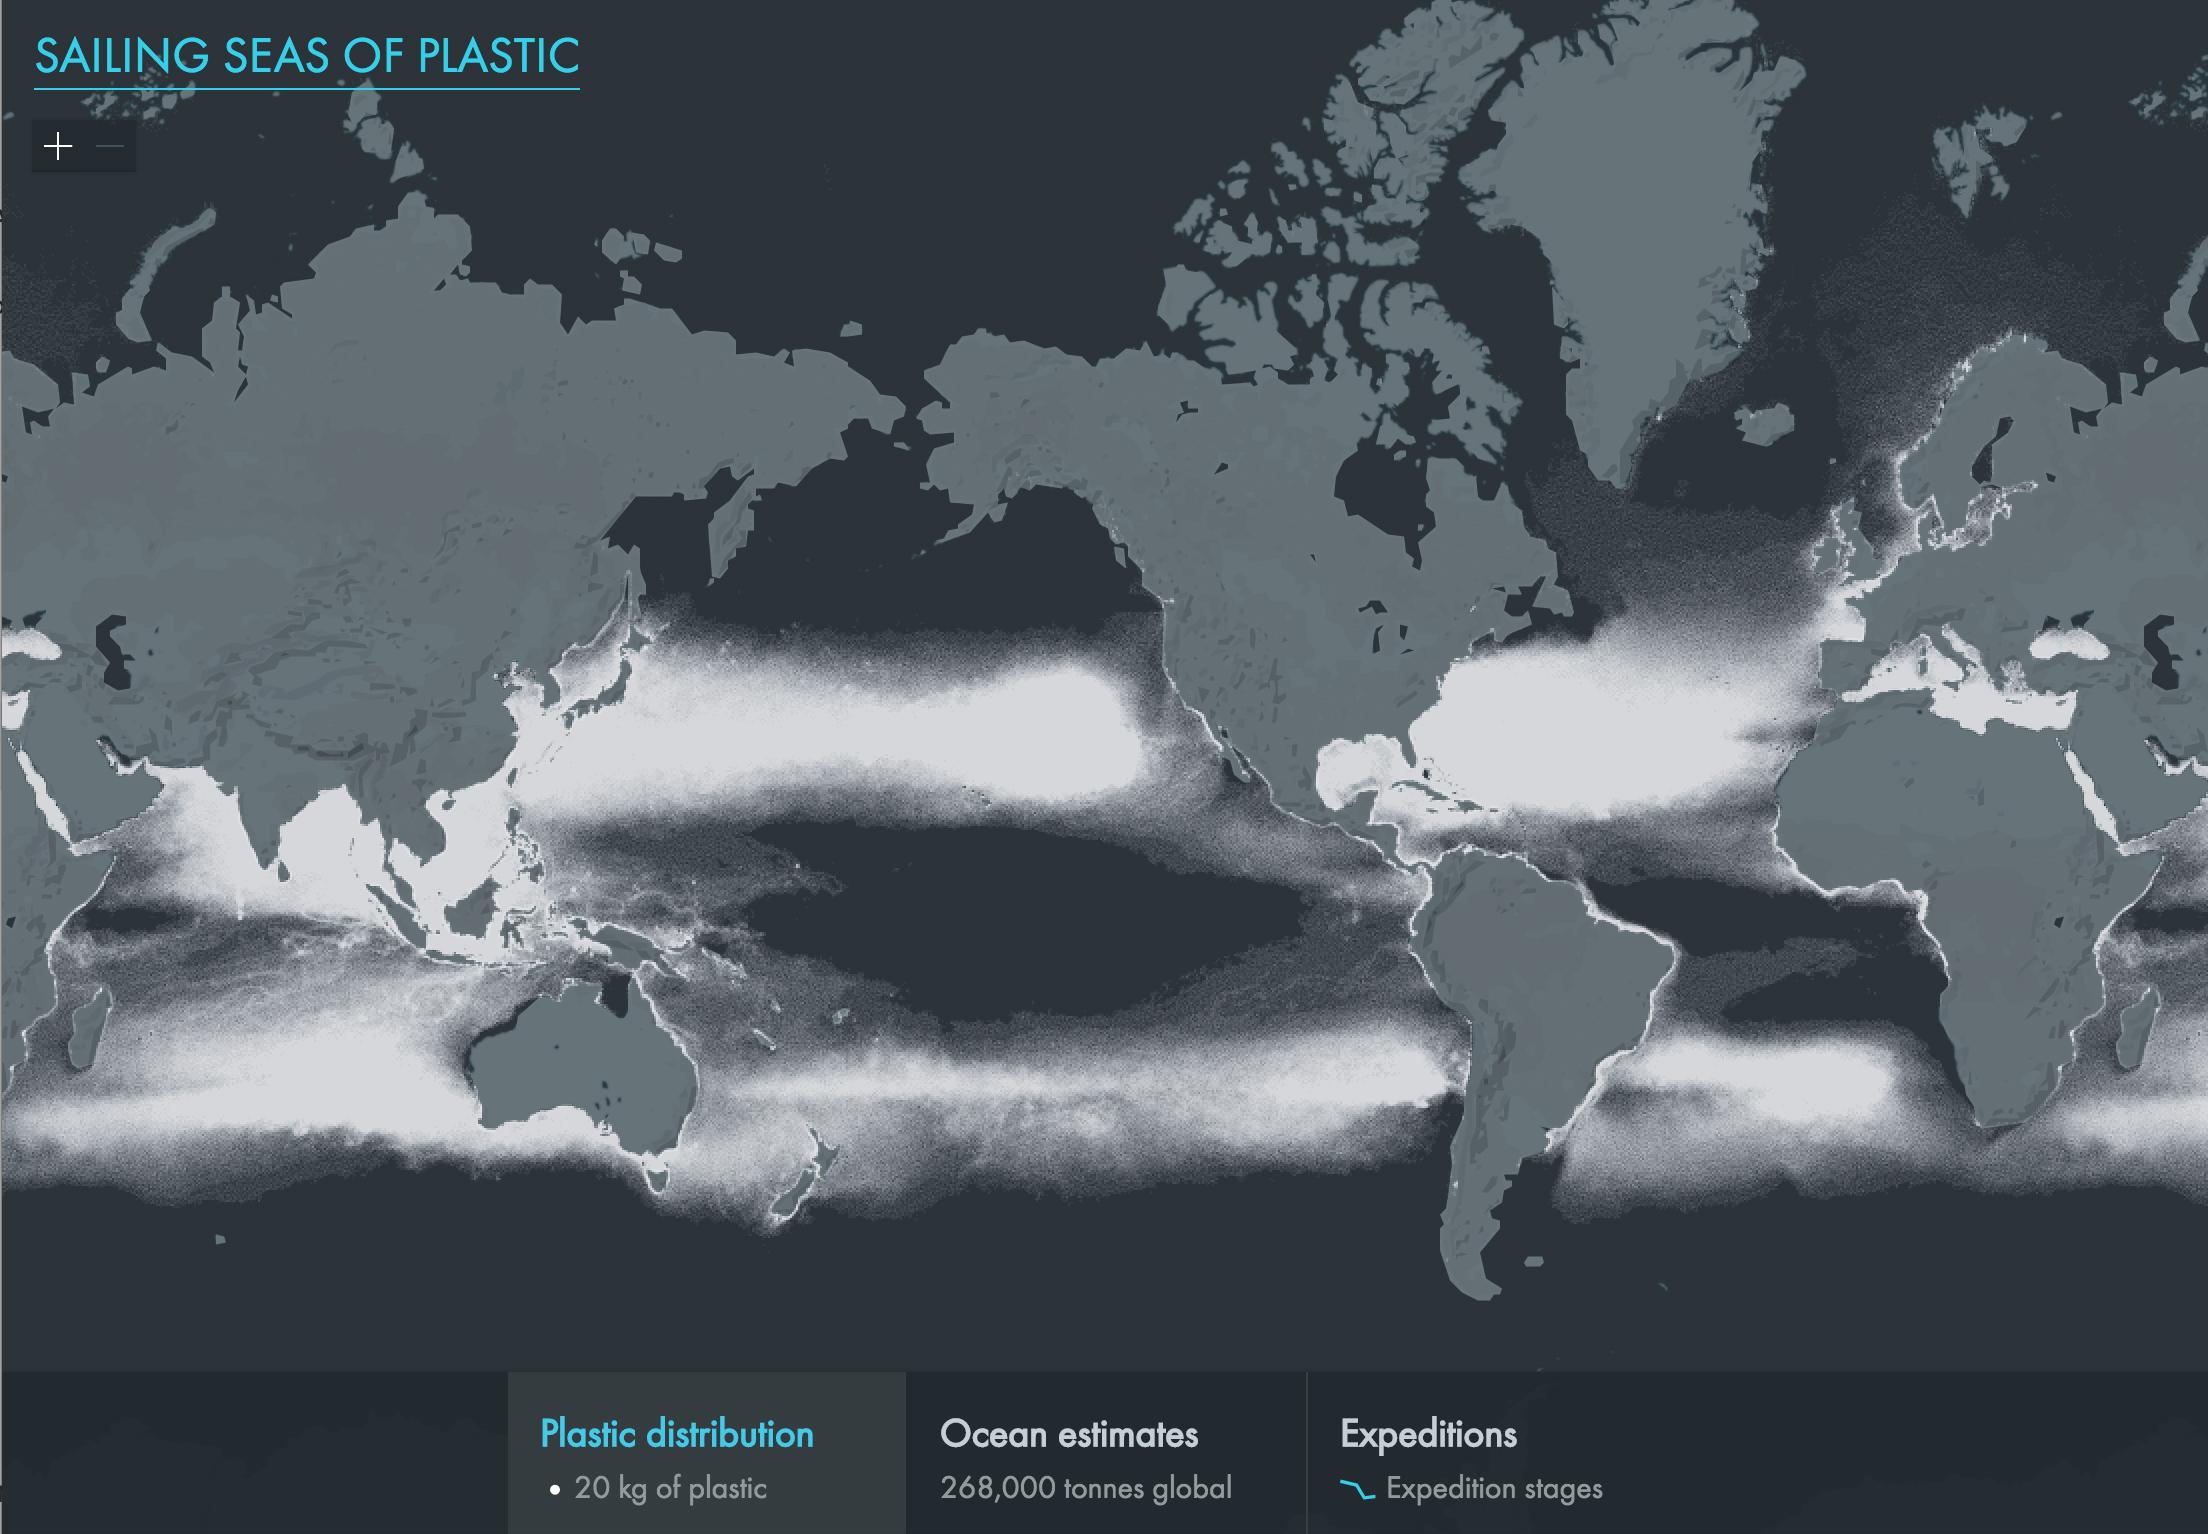 Sailing_a_sea_of_Plastic_Dumpark.jpg